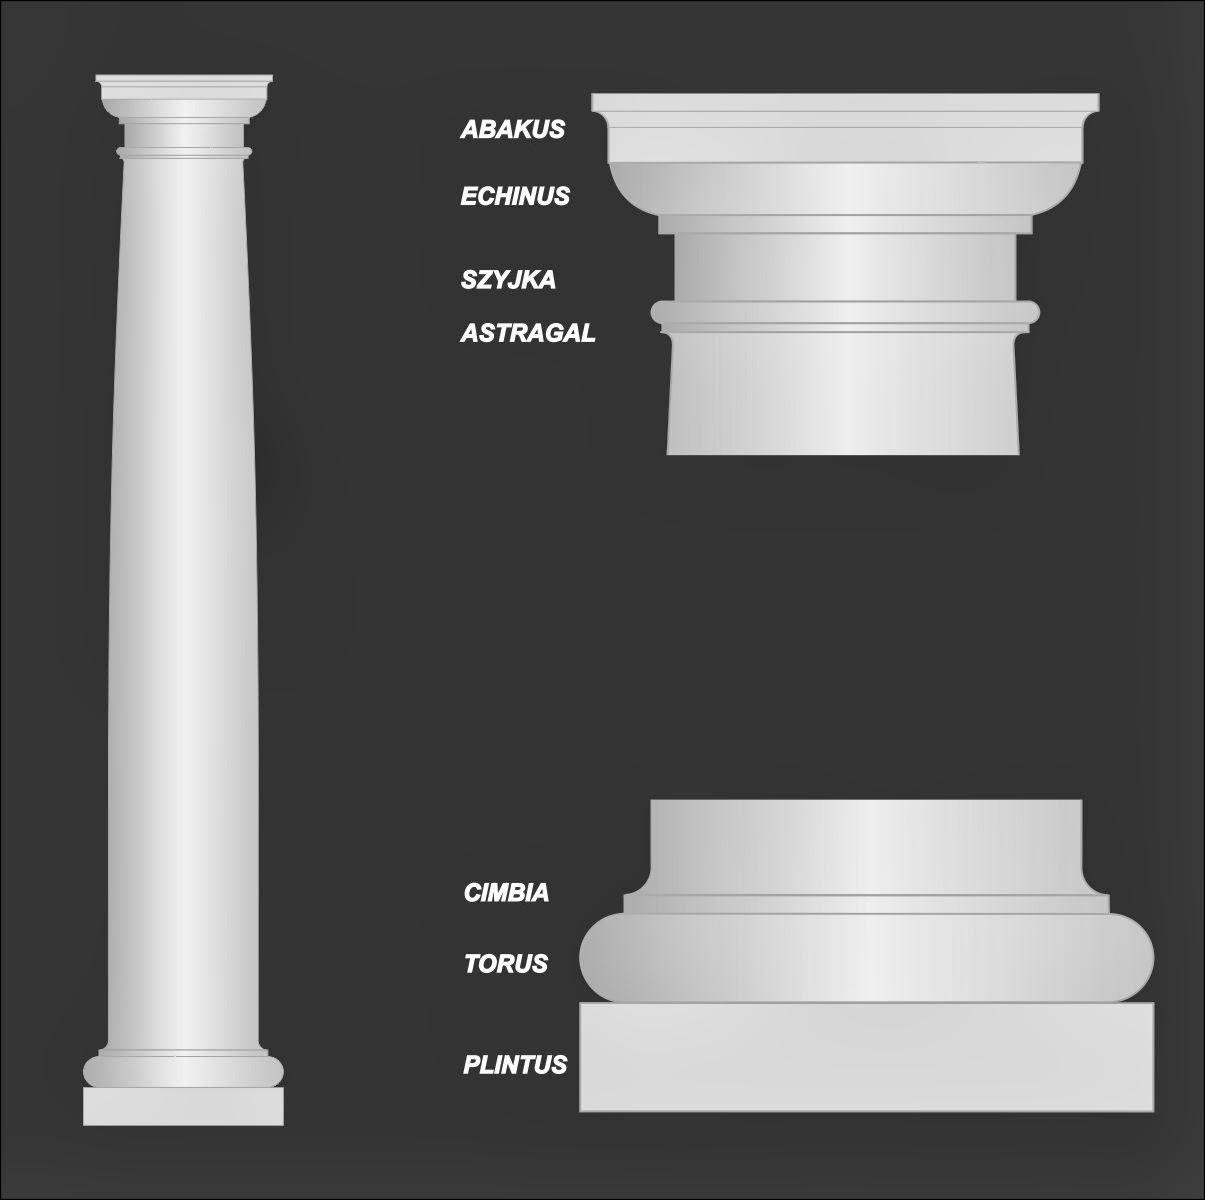 kolumny betonowe, kolumny toskańskie, toskanische saule